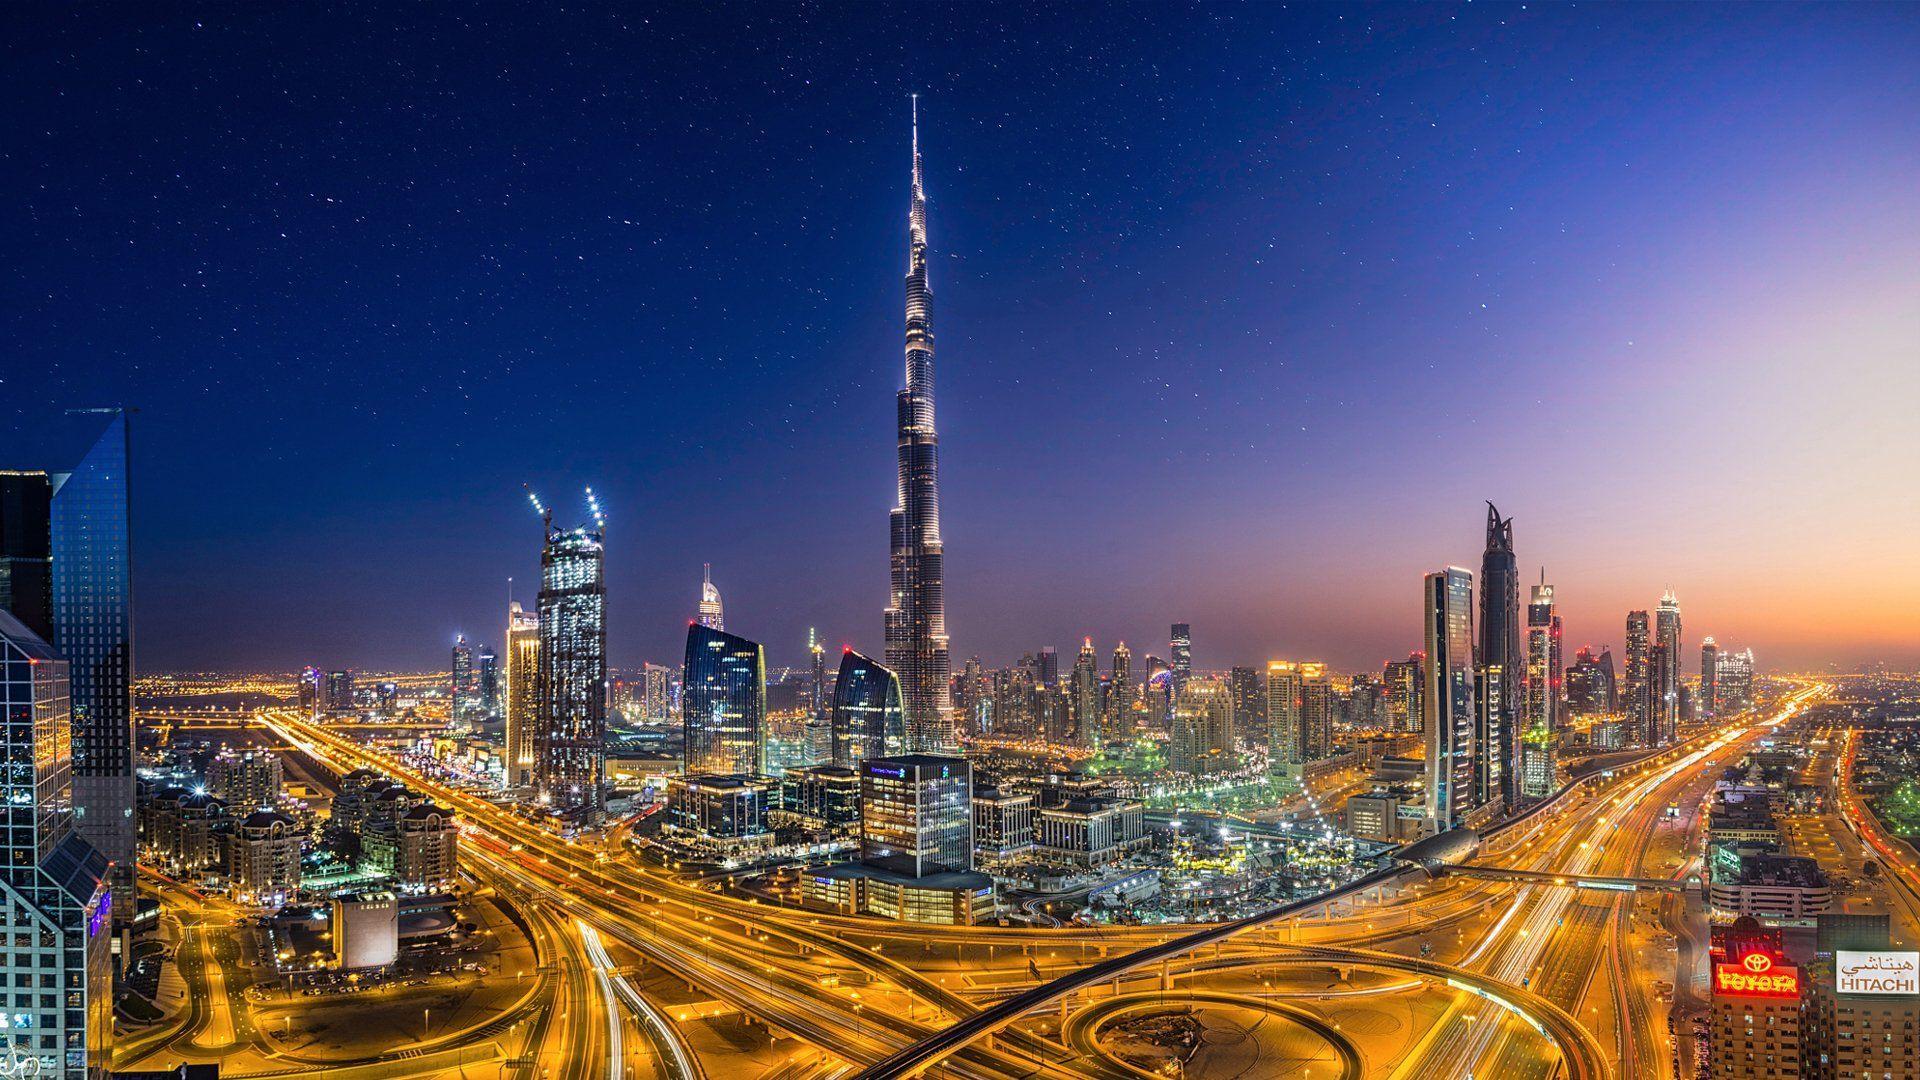 Dubai Desktop Wallpapers - Wallpaper Cave